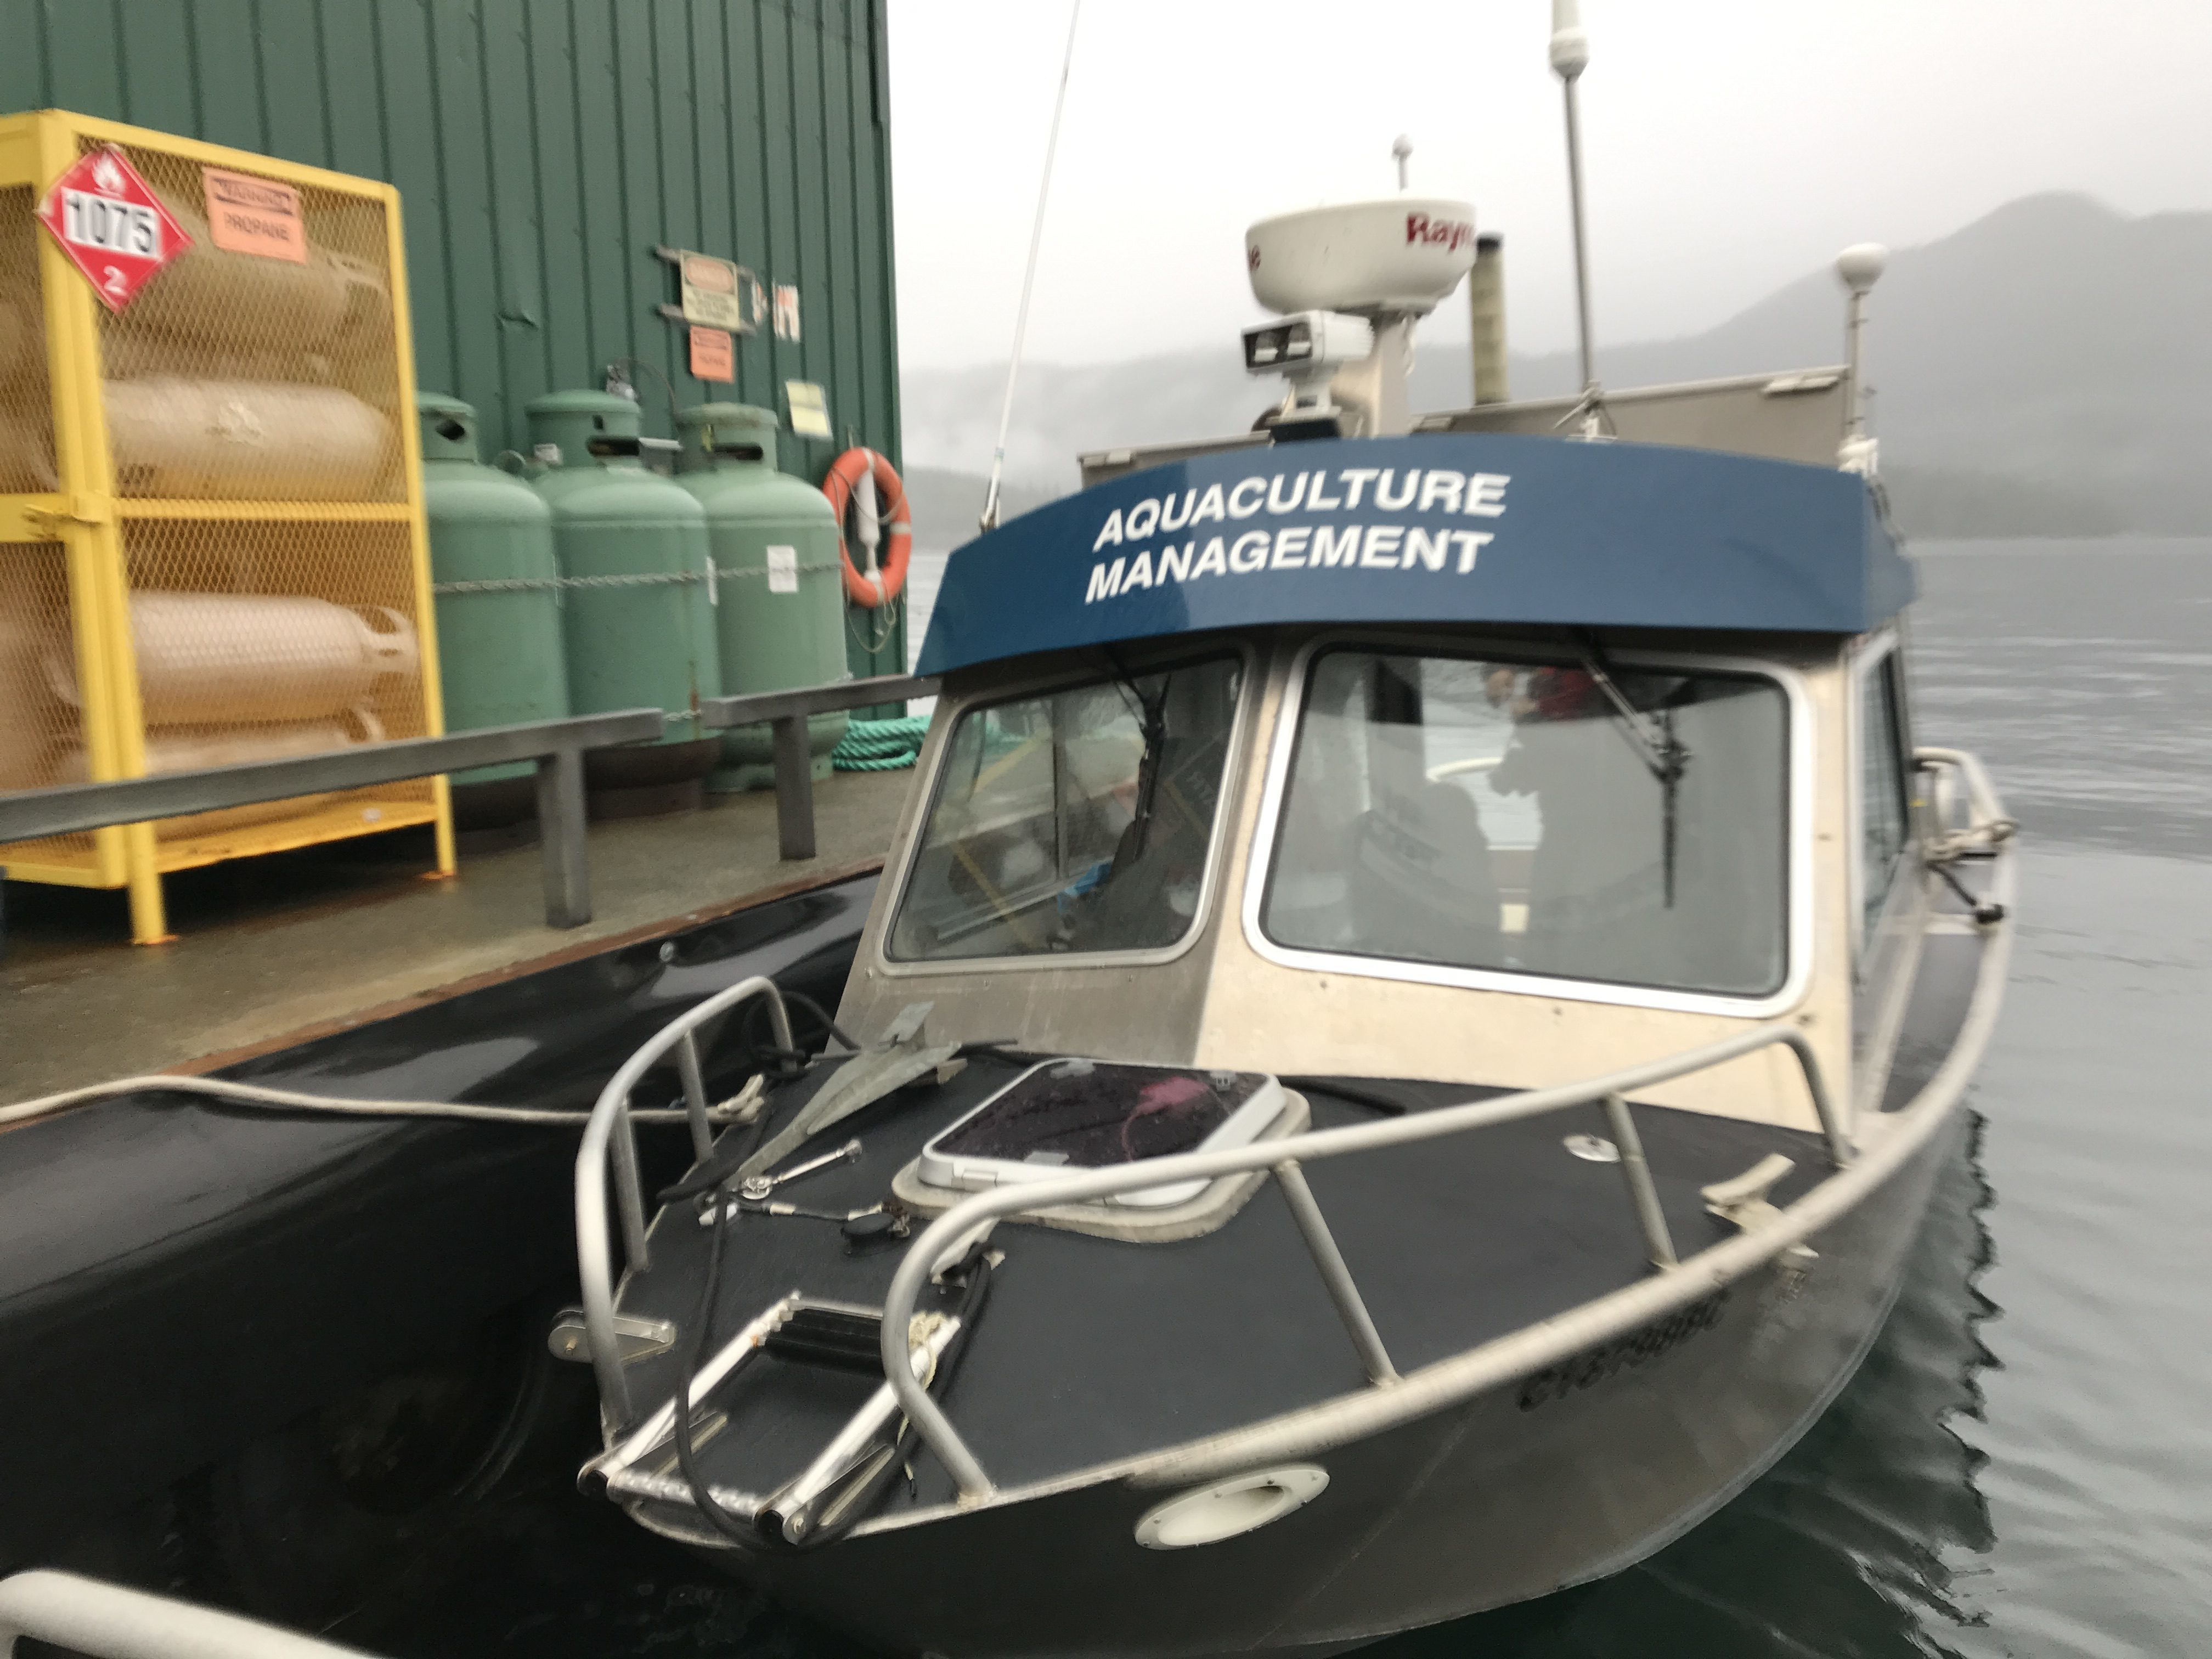 DFO officials conduct fish health audits at dozens of B.C. fish farms each year. (Megan Thomas/CBC)